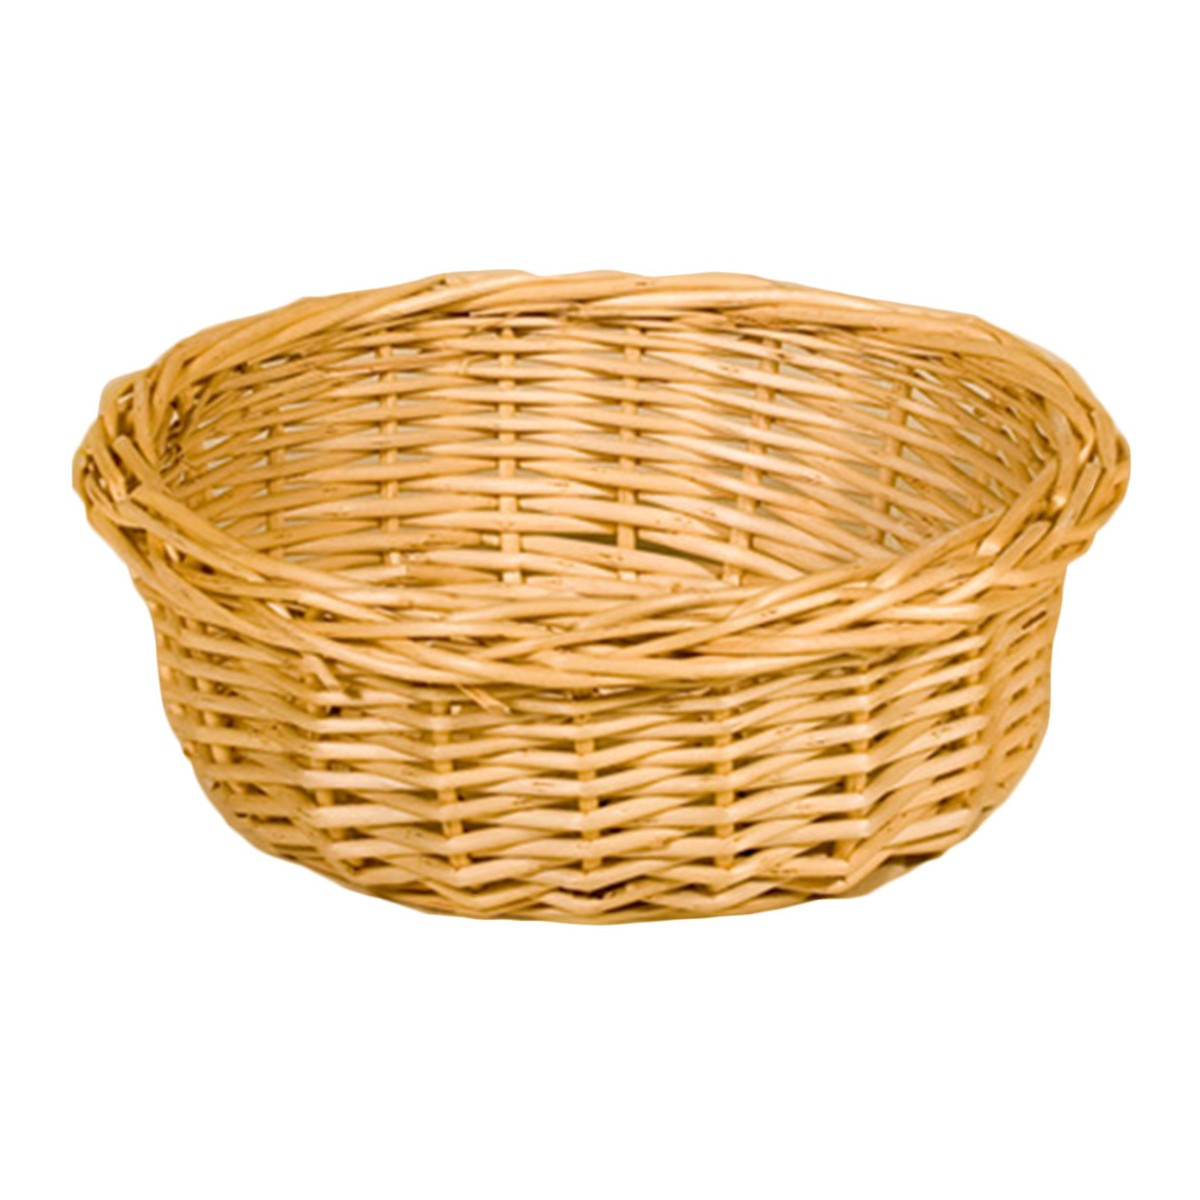 C mo hacer cestas con papel for Fabrica de canastas de mimbre